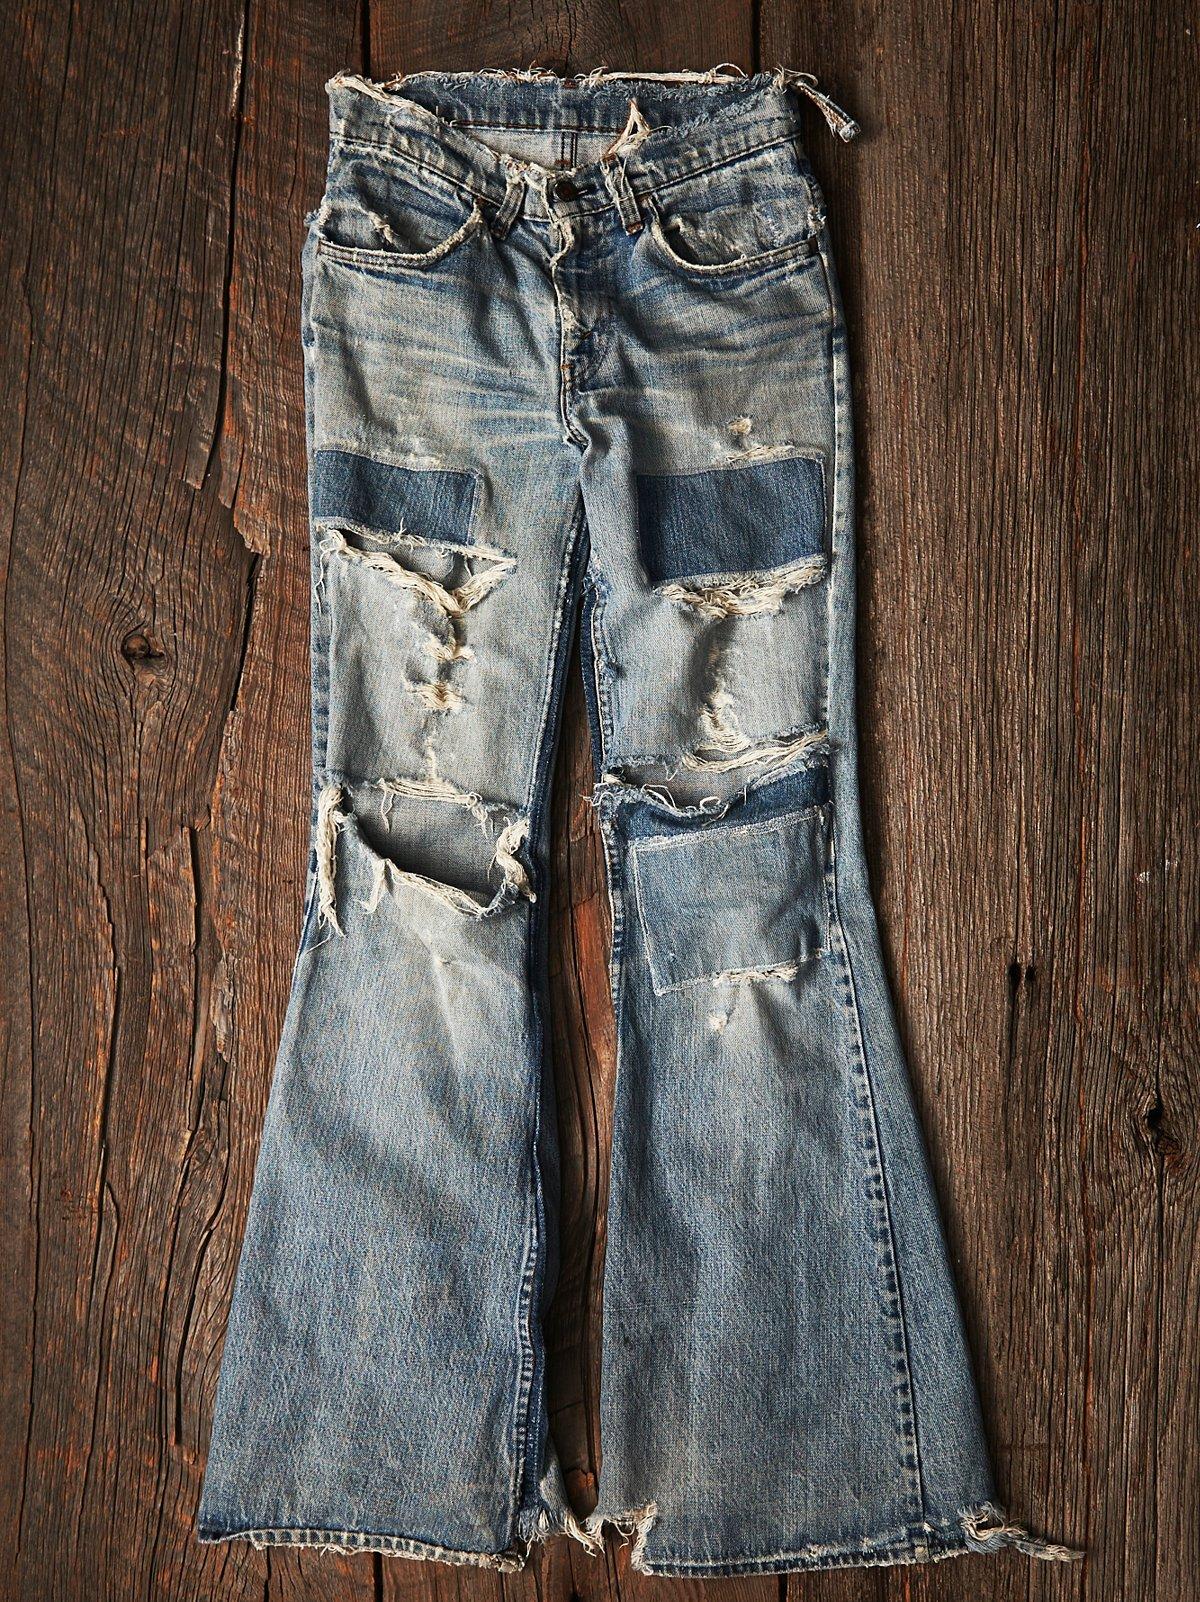 Vintage 1970s Patchwork Jean